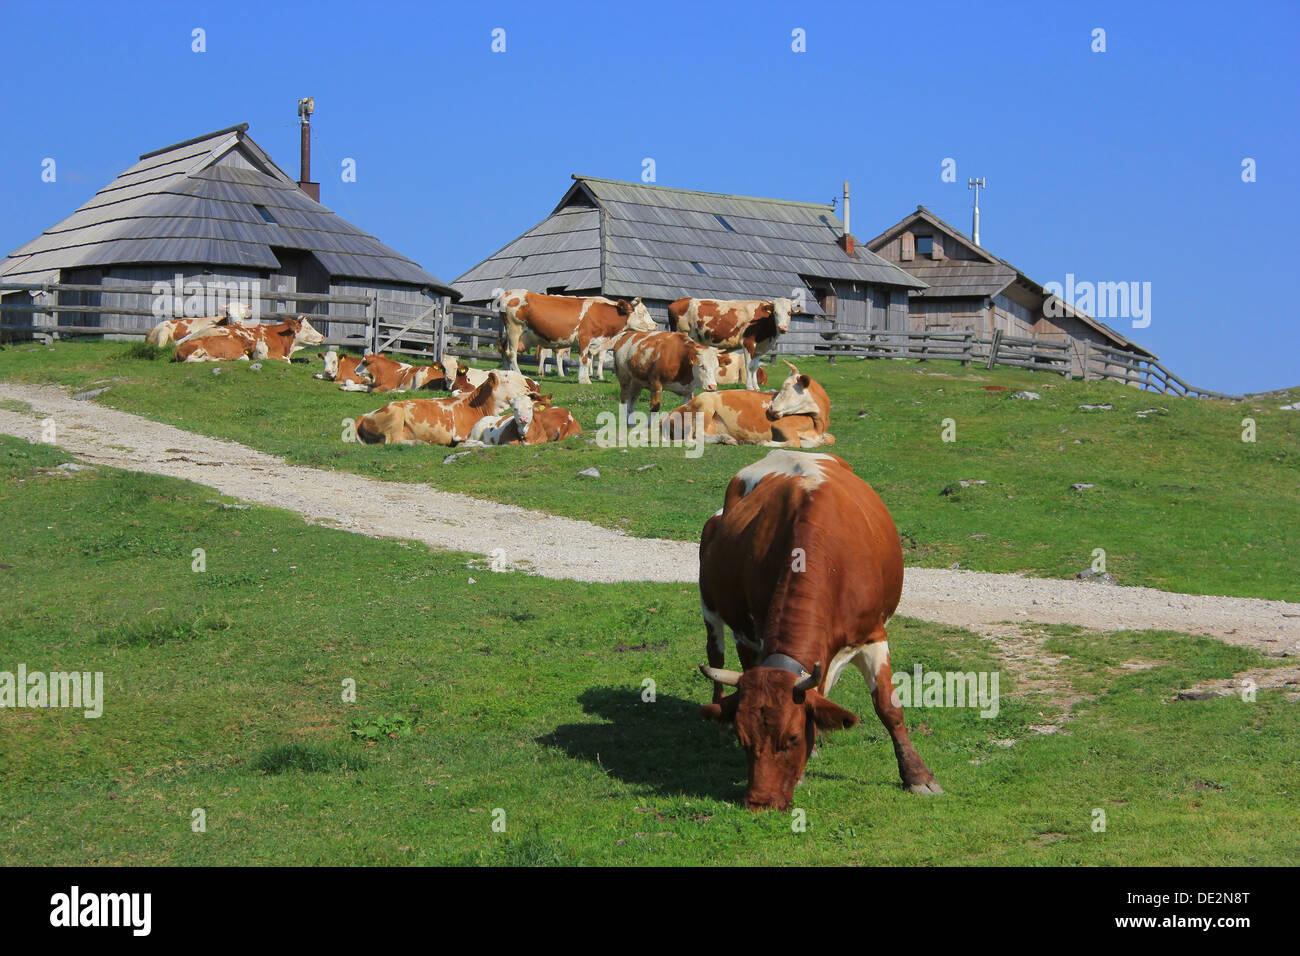 Cow eating grass, Velika planina pastureland scenery, Kamnik Alps, Slovenia - Stock Image